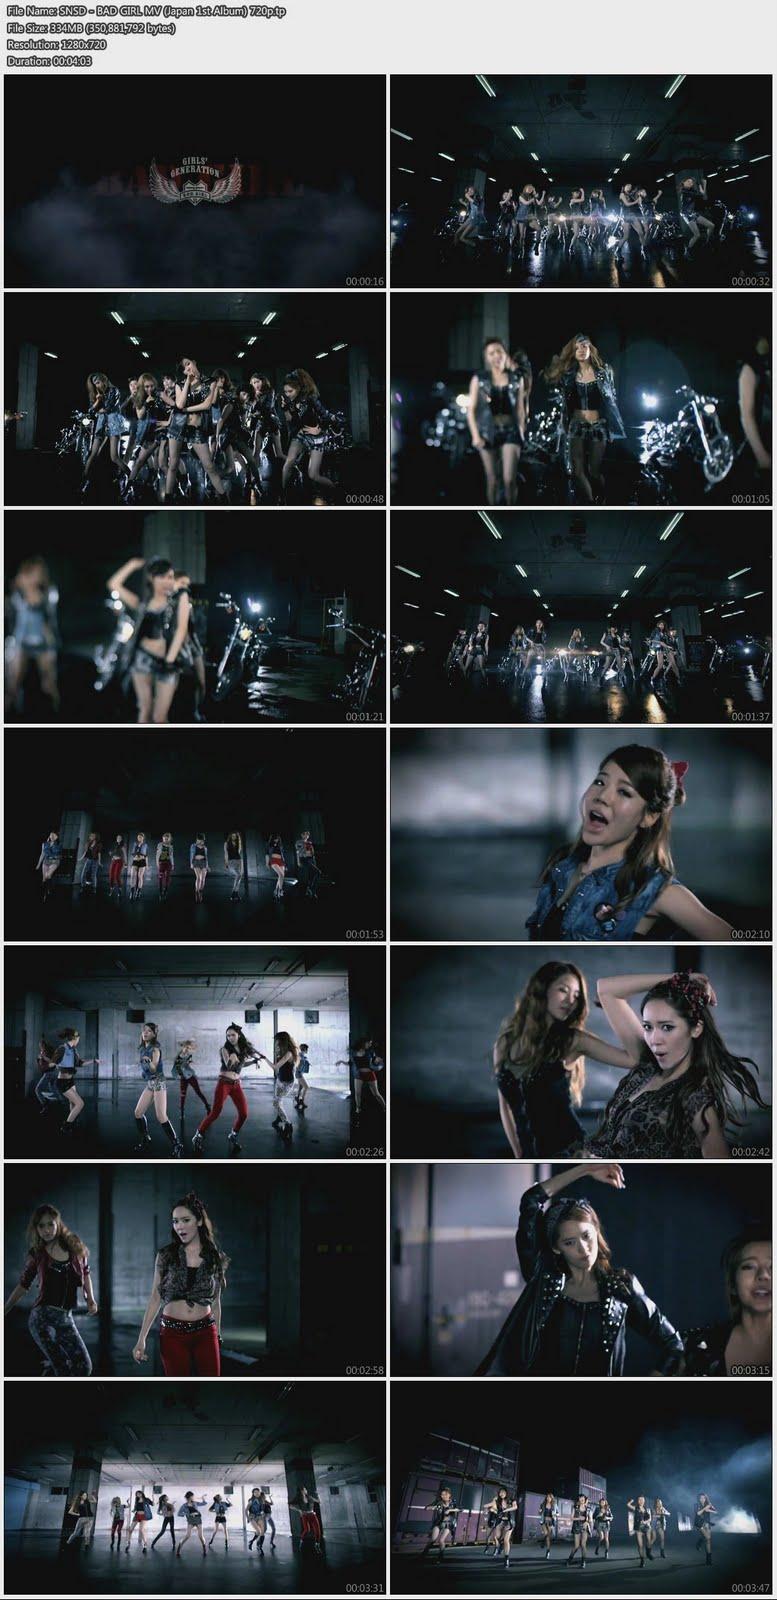 Kpop music video gif on gifer by lagrinn.